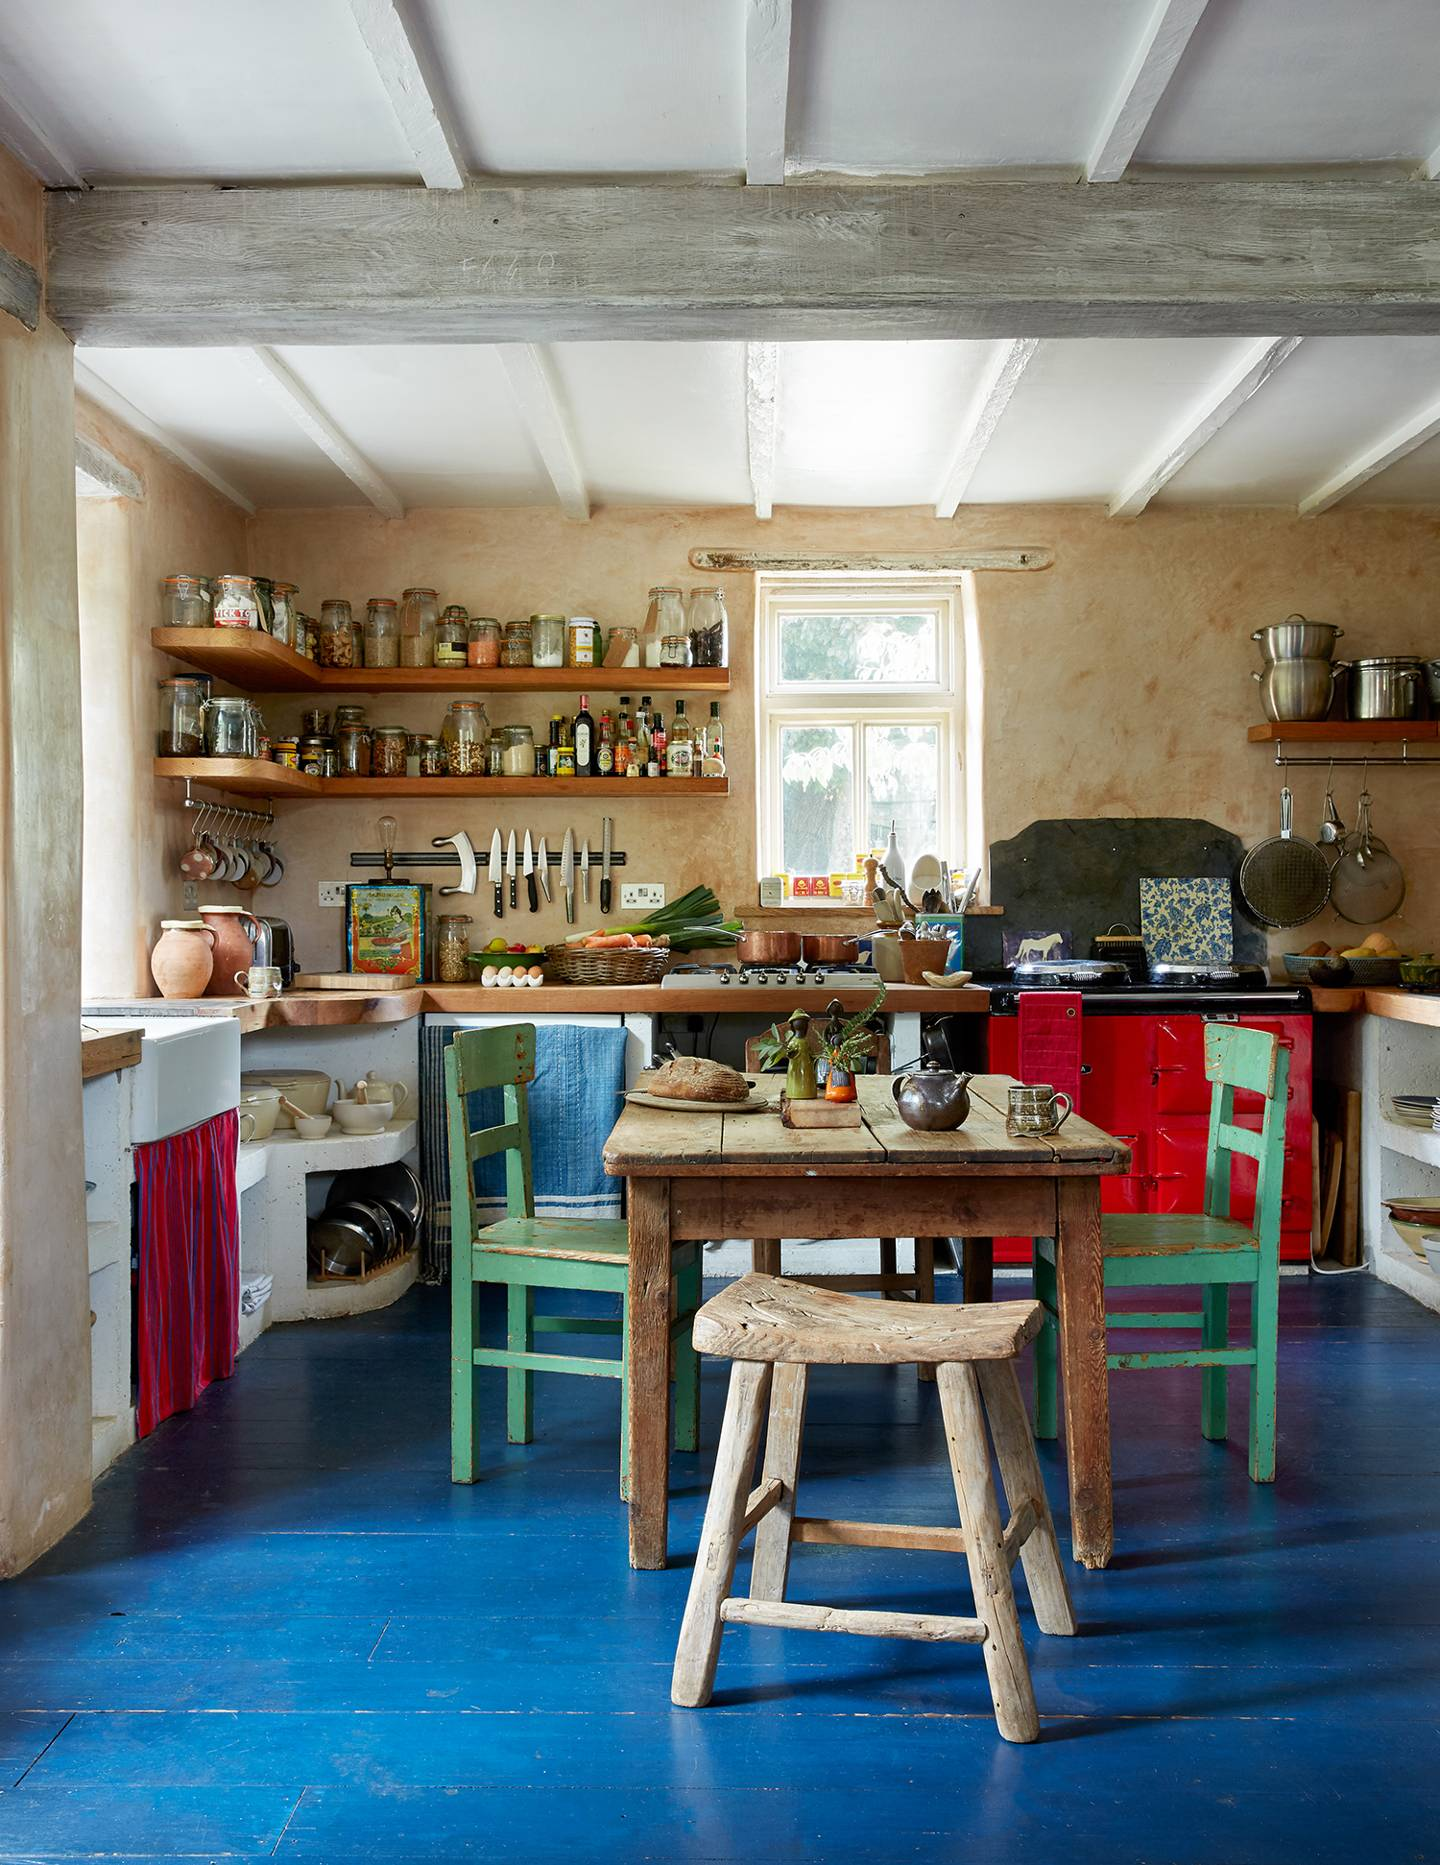 Journalist Fiona Golfar tells the story of her Cornish home